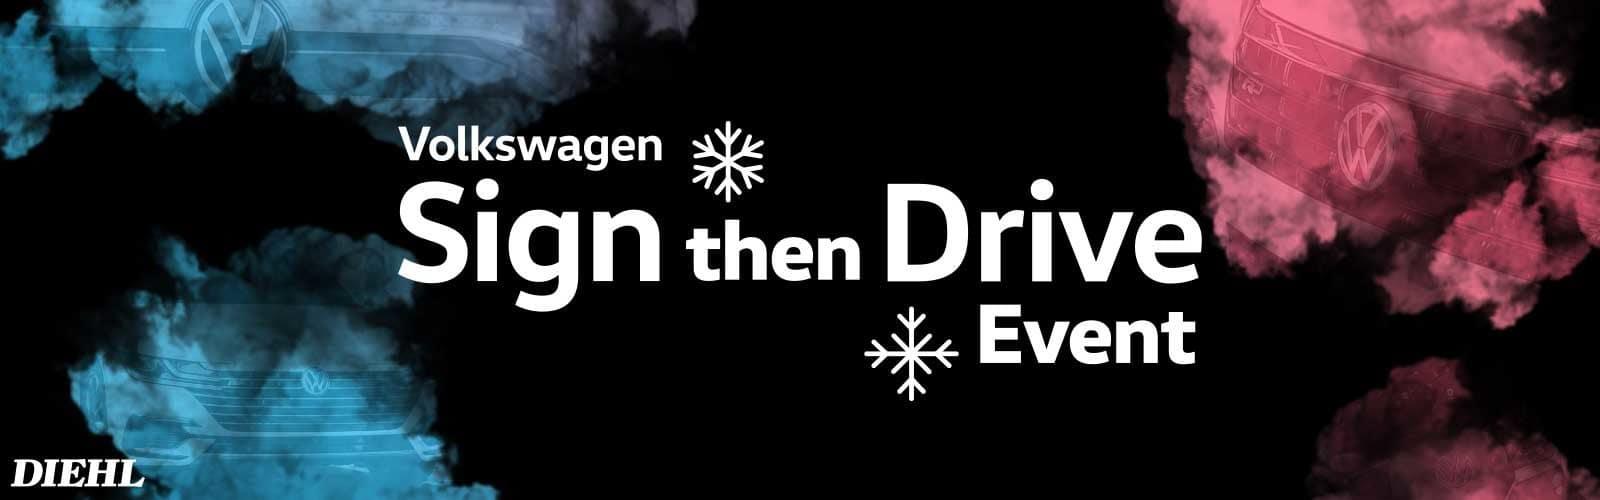 diehl volkswagen butler pa vw sign then drive event lease special diehl automotive